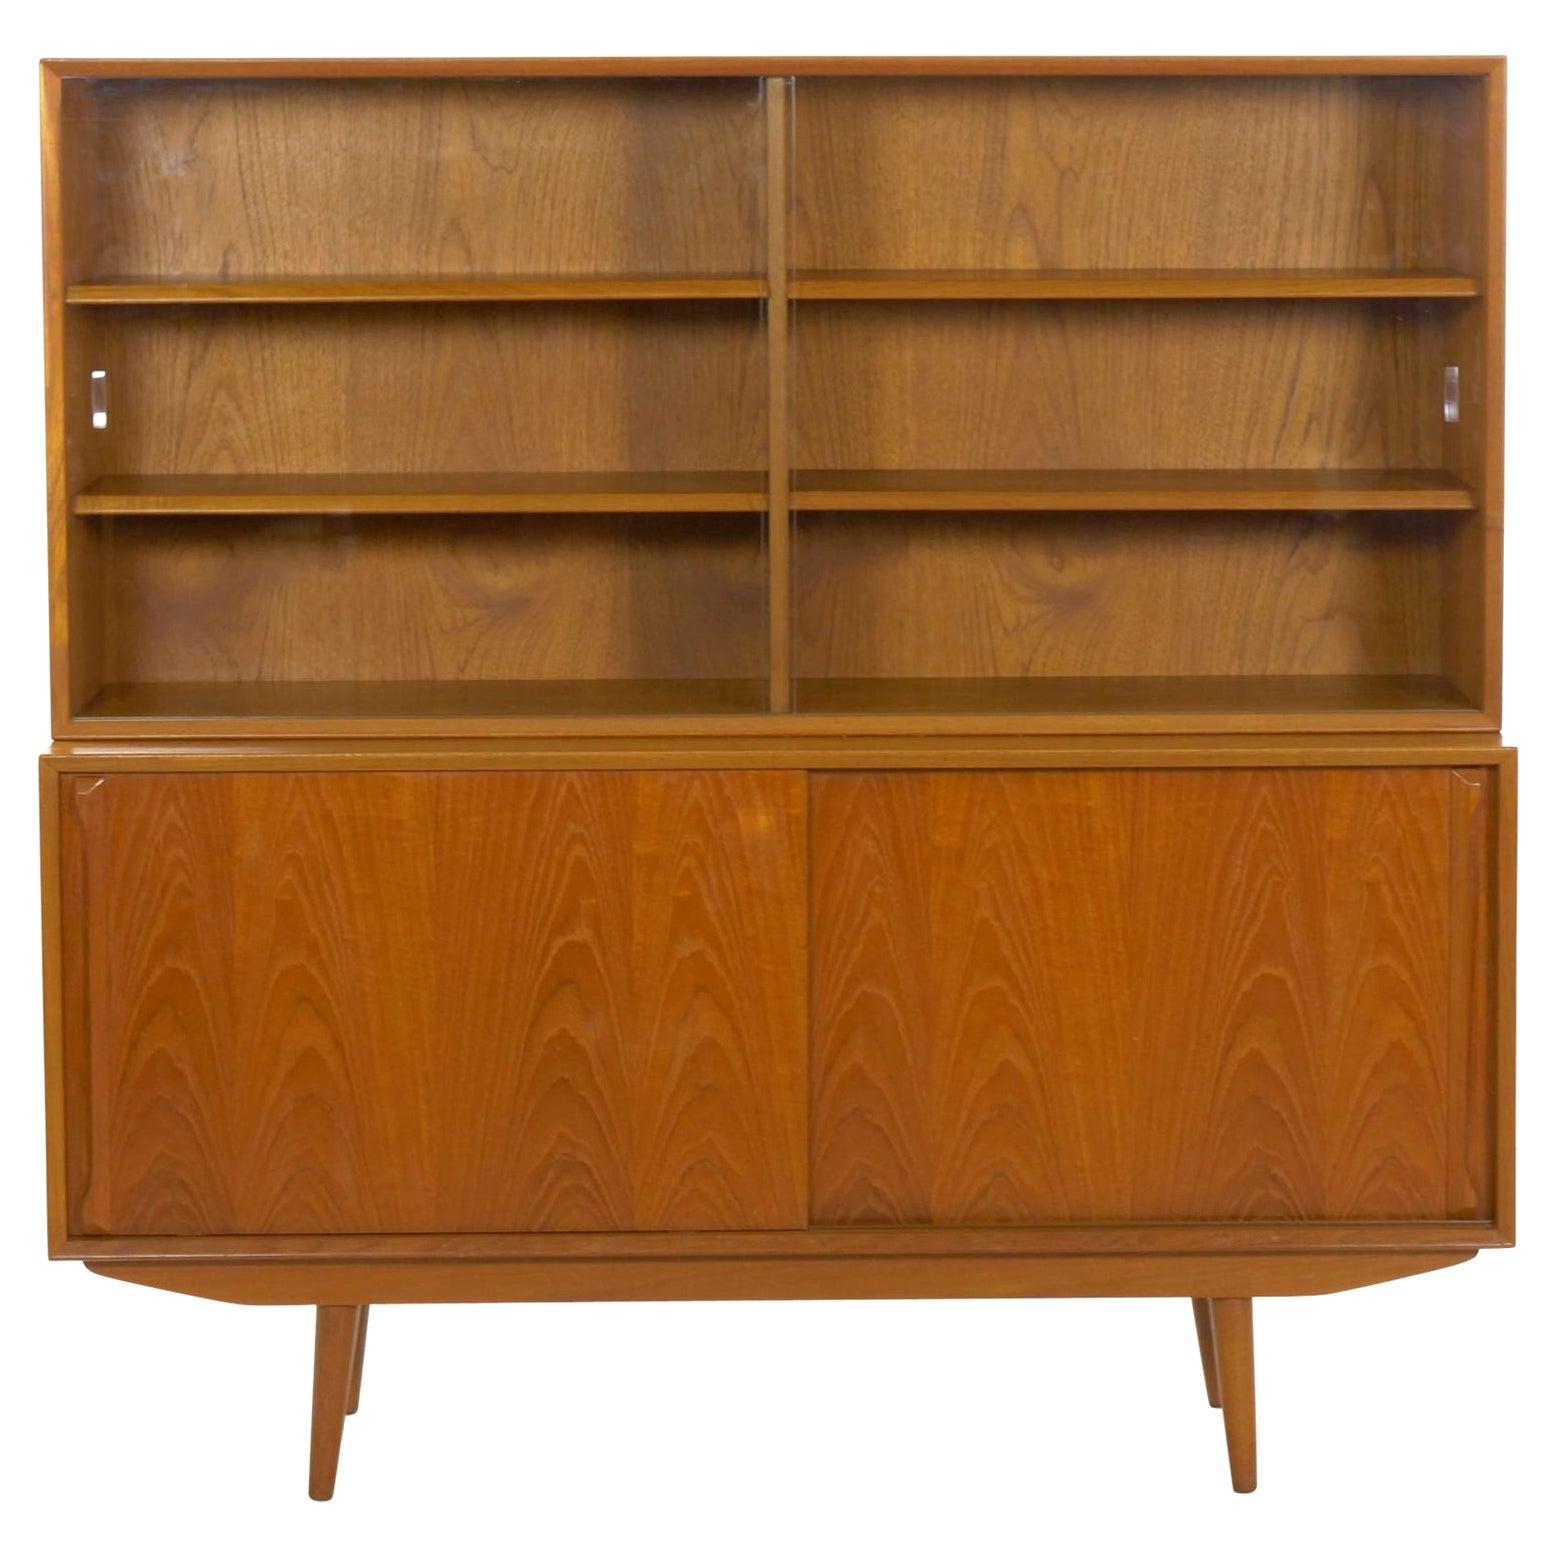 Scandinavian Mid-Century Modern Teak Bookcase Cabinet, circa 1960-1970